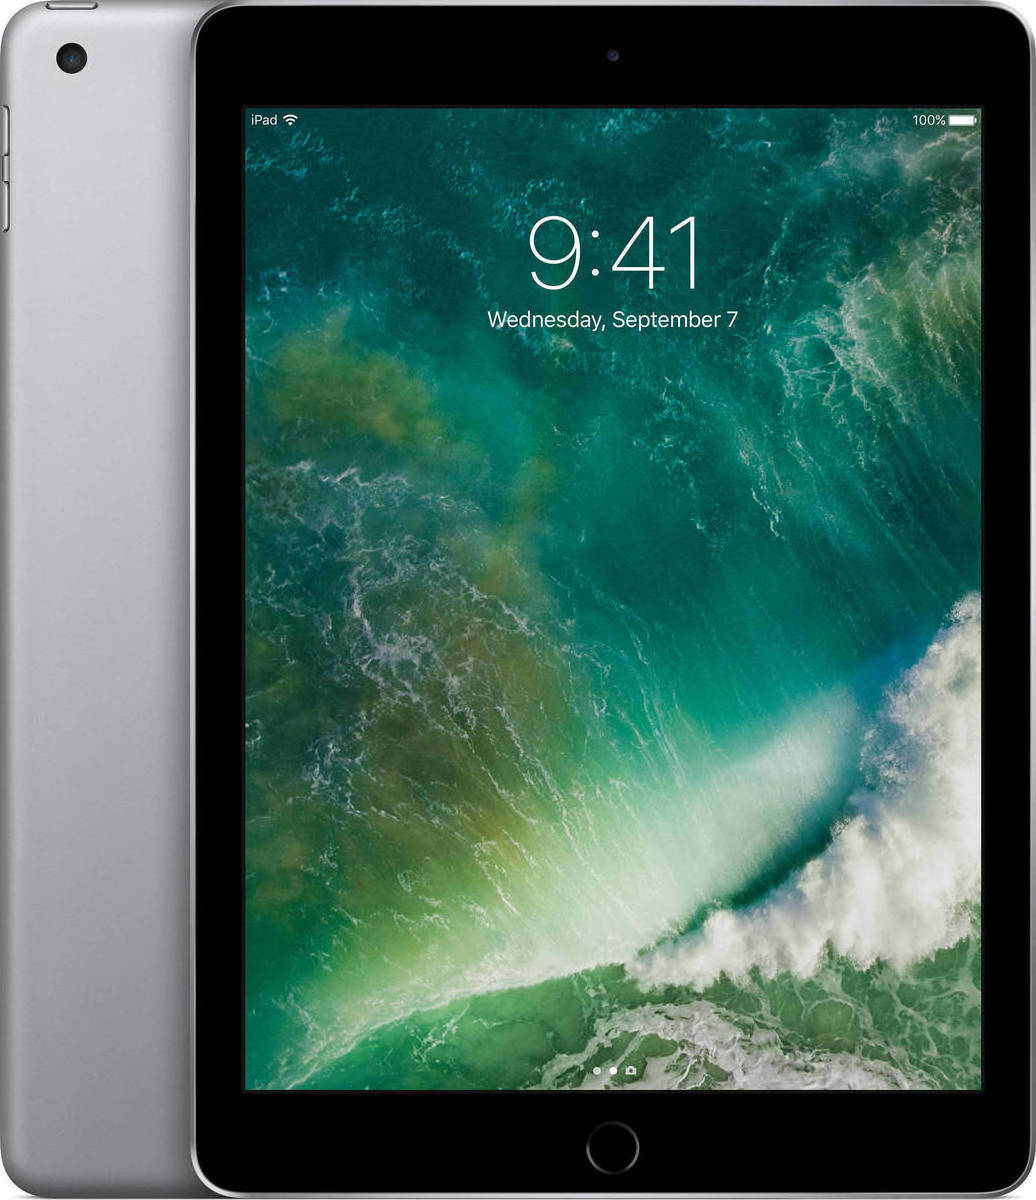 Apple iPad 9.7'' 2017 WiFi 32GB Space Grey Με Αντάπτορα Πληρωμή έως 12 δόσεις